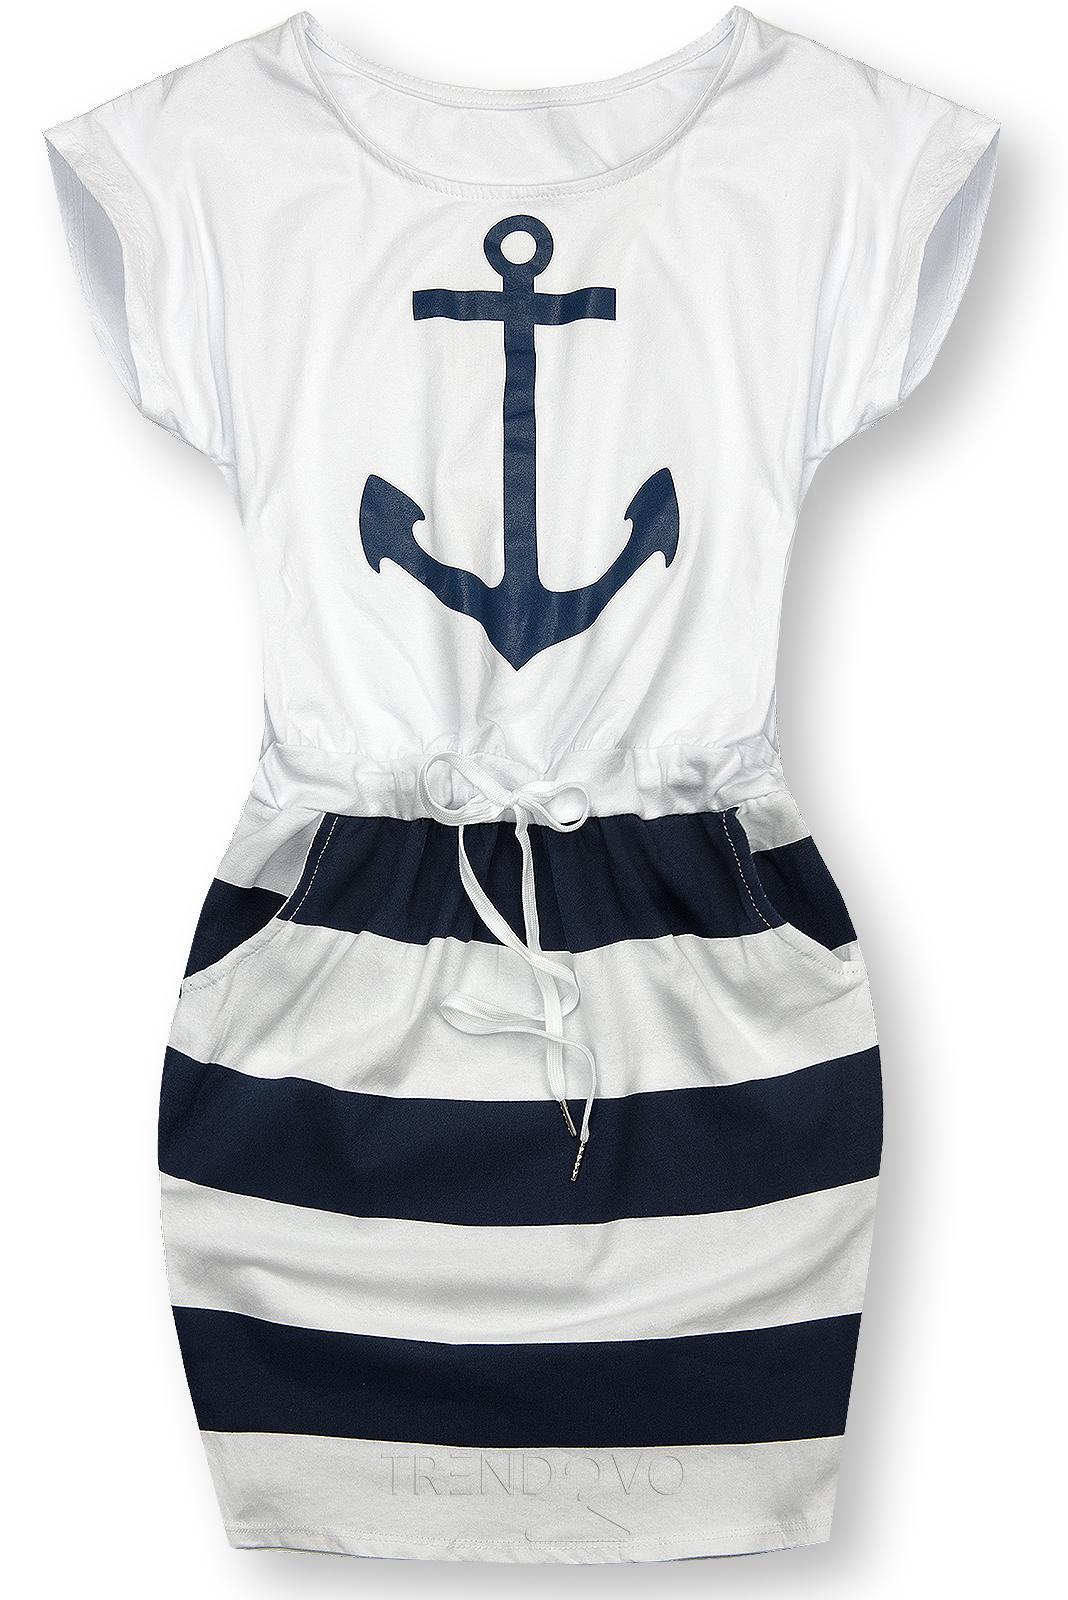 Modro-biele šaty s kotvou